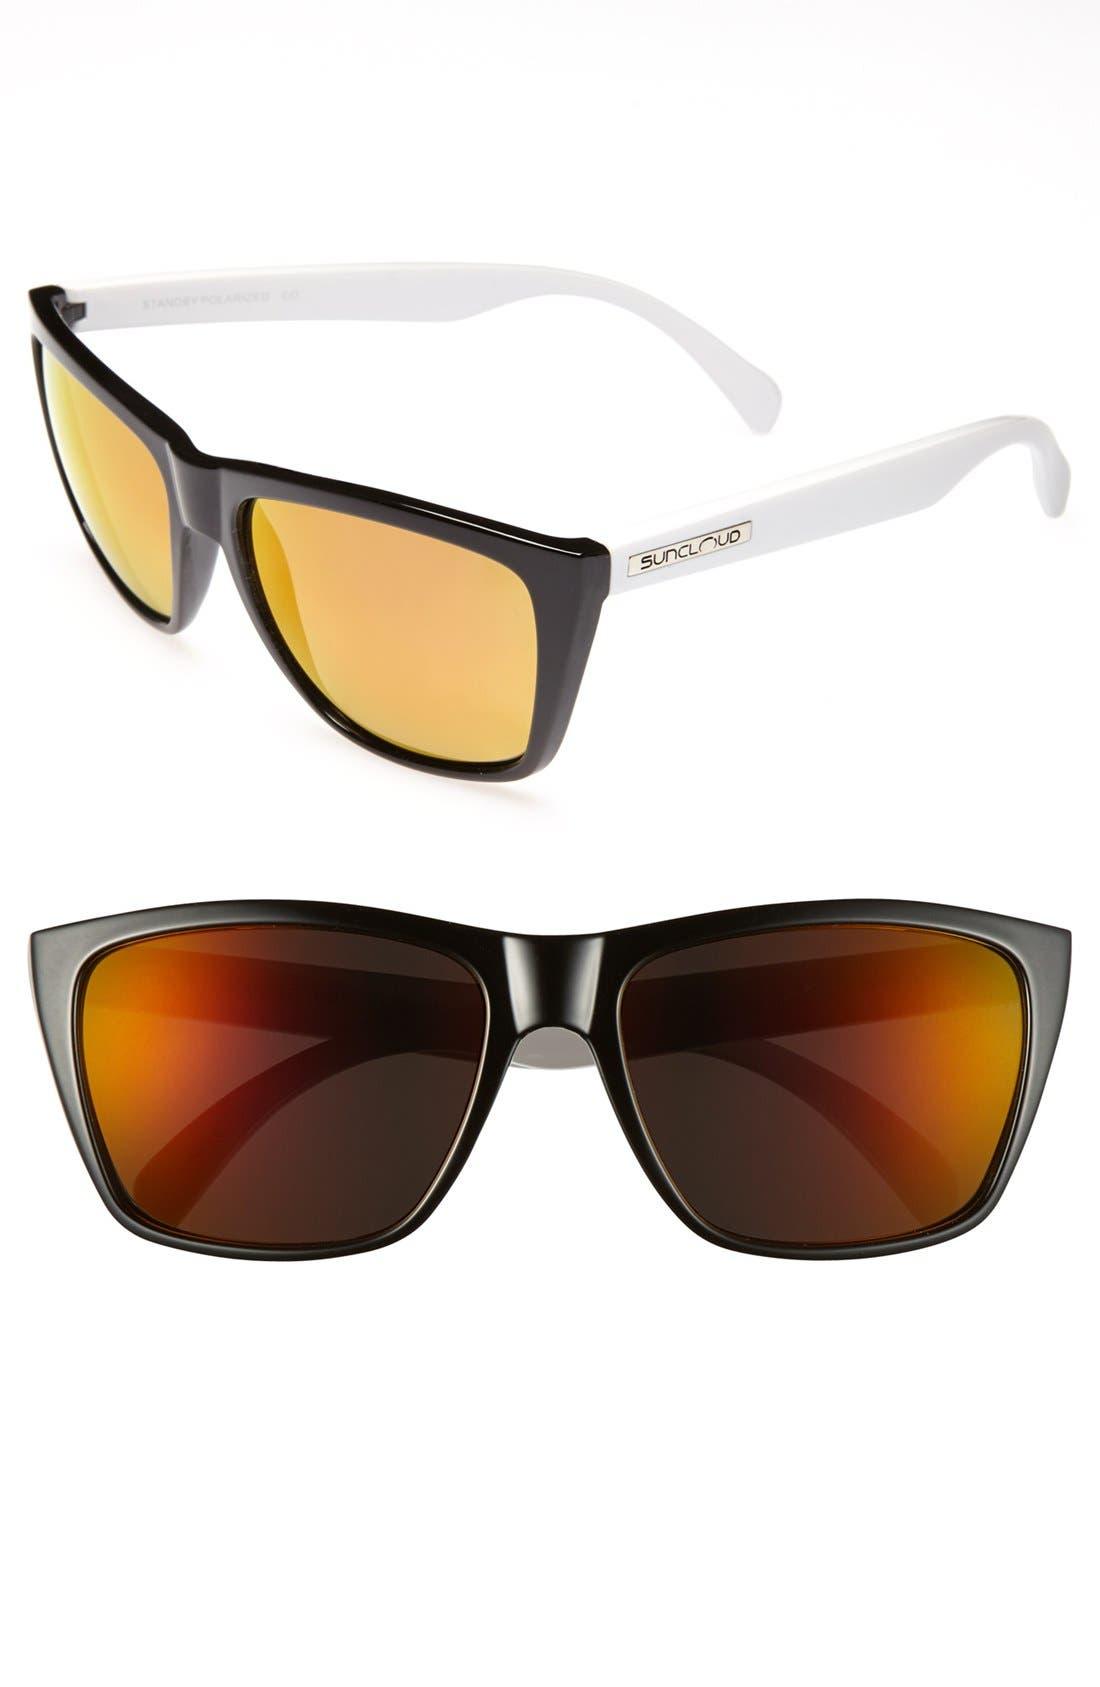 Main Image - Suncloud 'Standby' Polarized Sunglasses